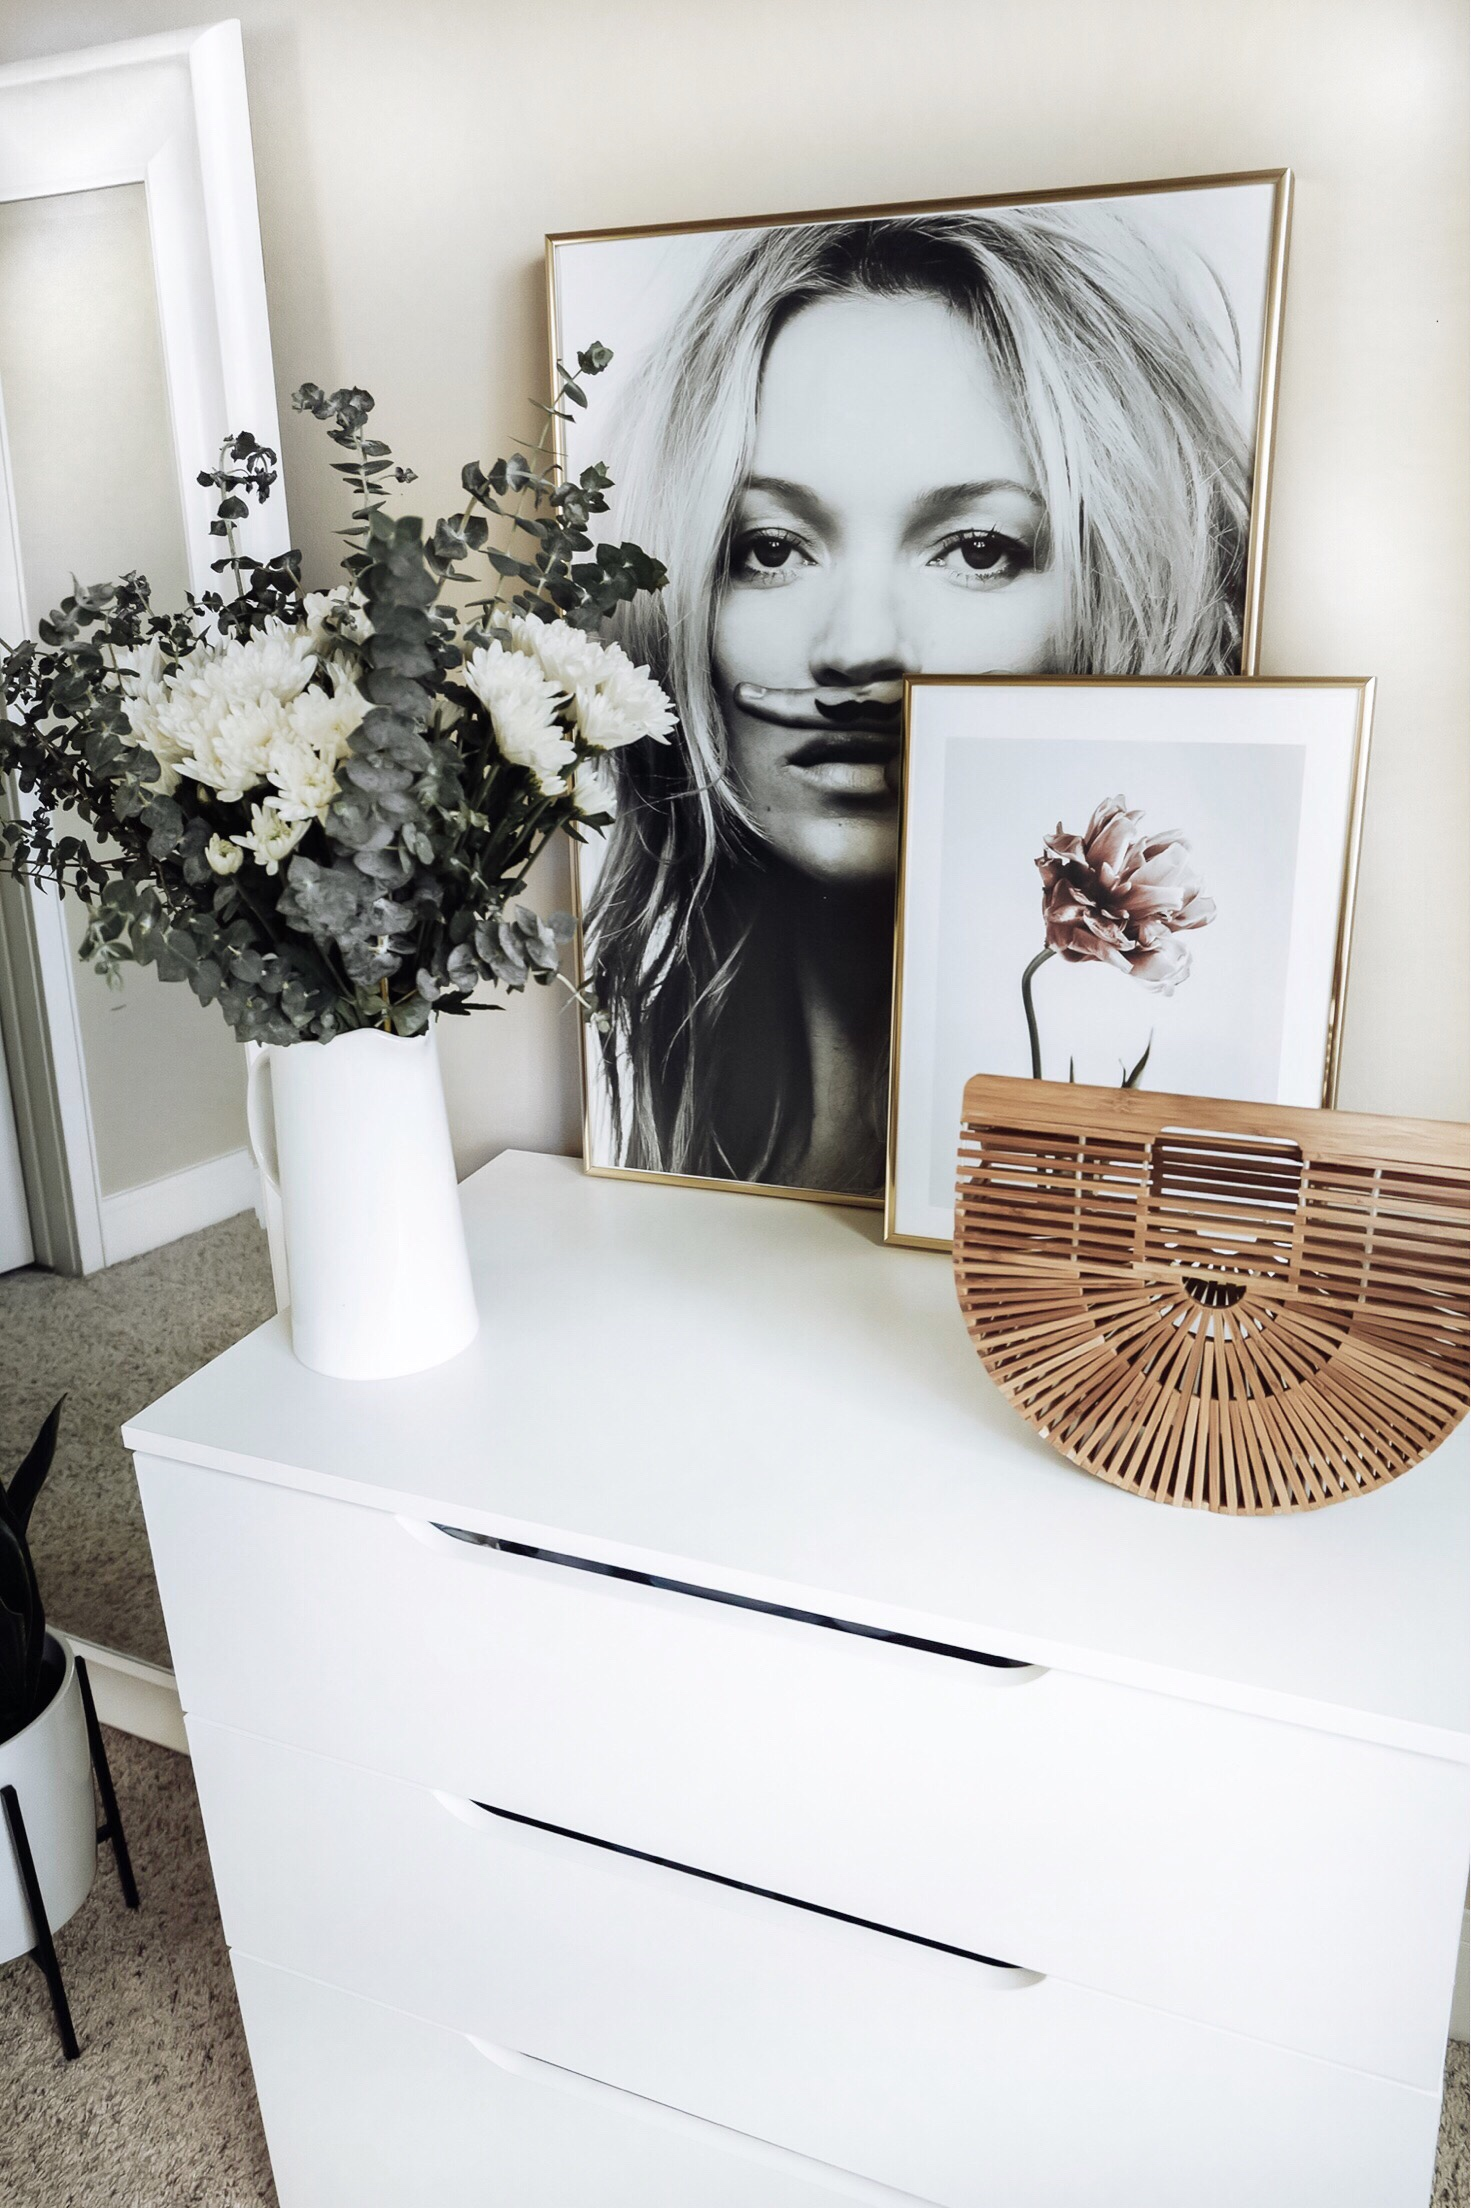 Tiffany Jais Houston fashion and lifestyle blogger | Friday feels | Deseno art prints Kate Moss, Life is a joke print | Pink Tulip Print, home decor |